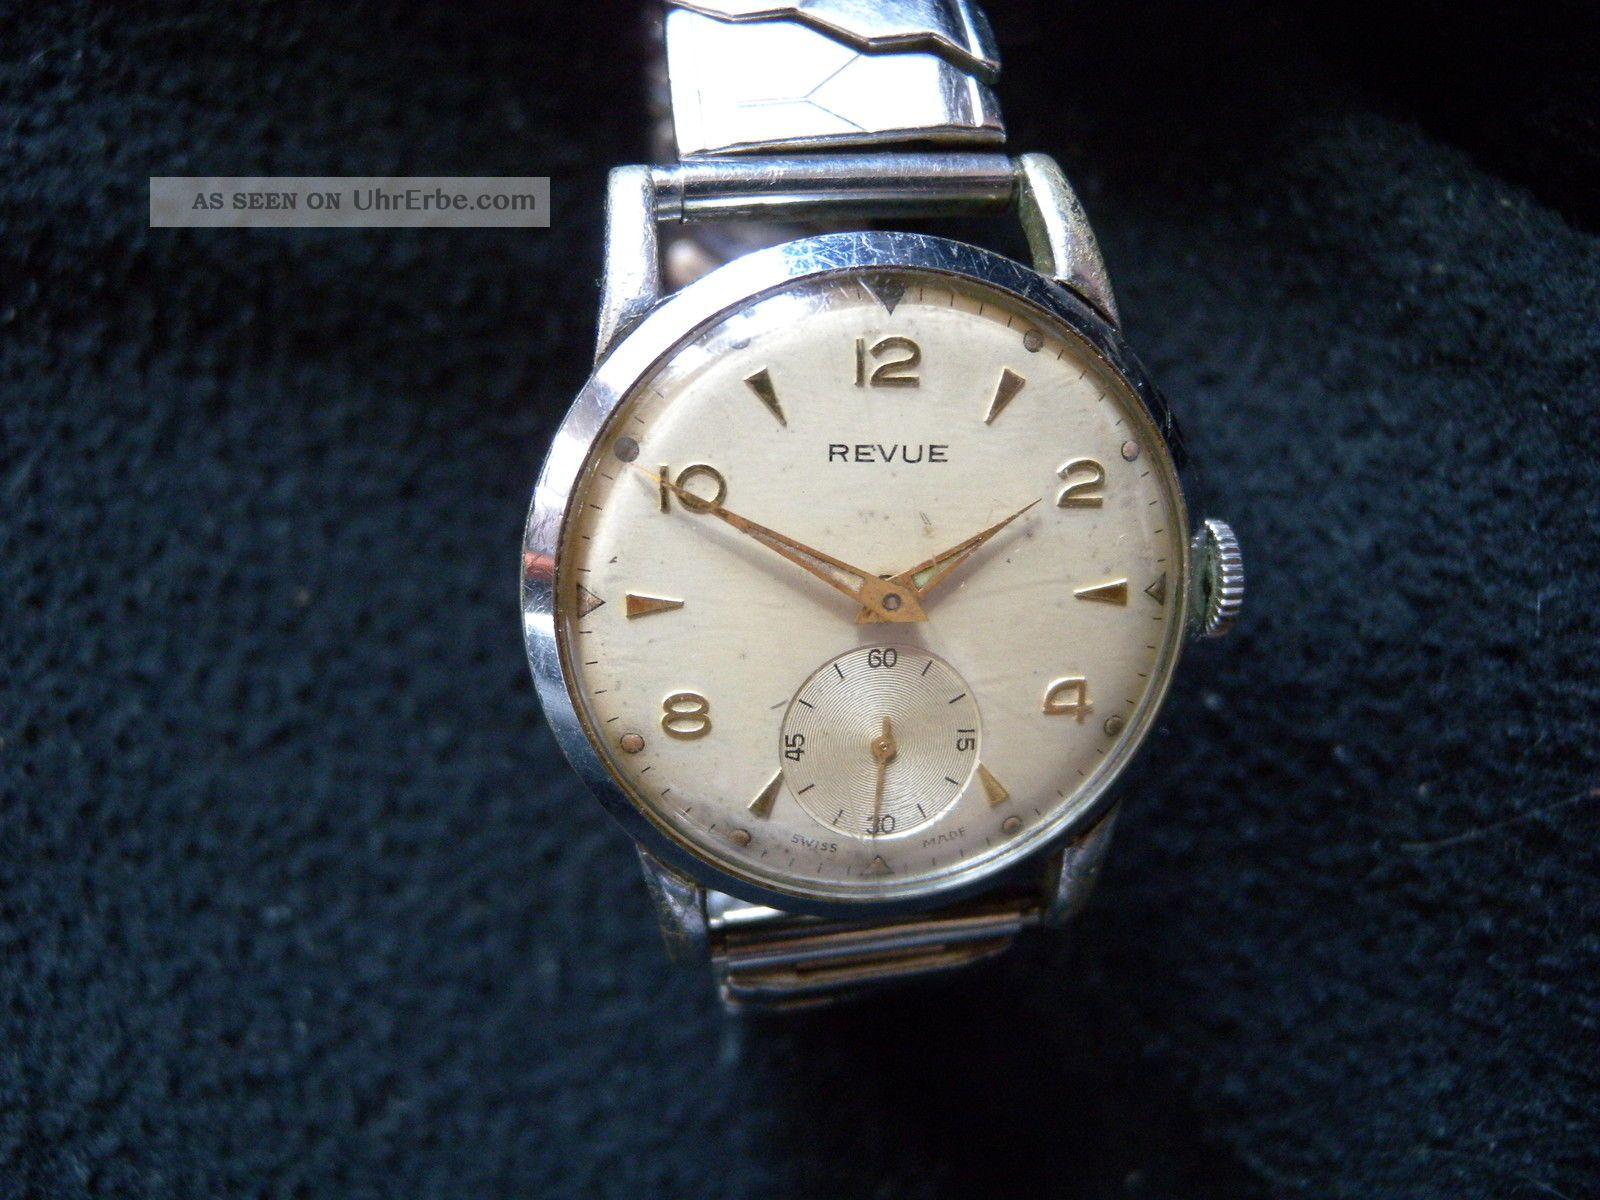 Revue Uhr Vintage Revue Watch 50s Handaufzug Breguet Hairspring Cal.  59 Armbanduhren Bild